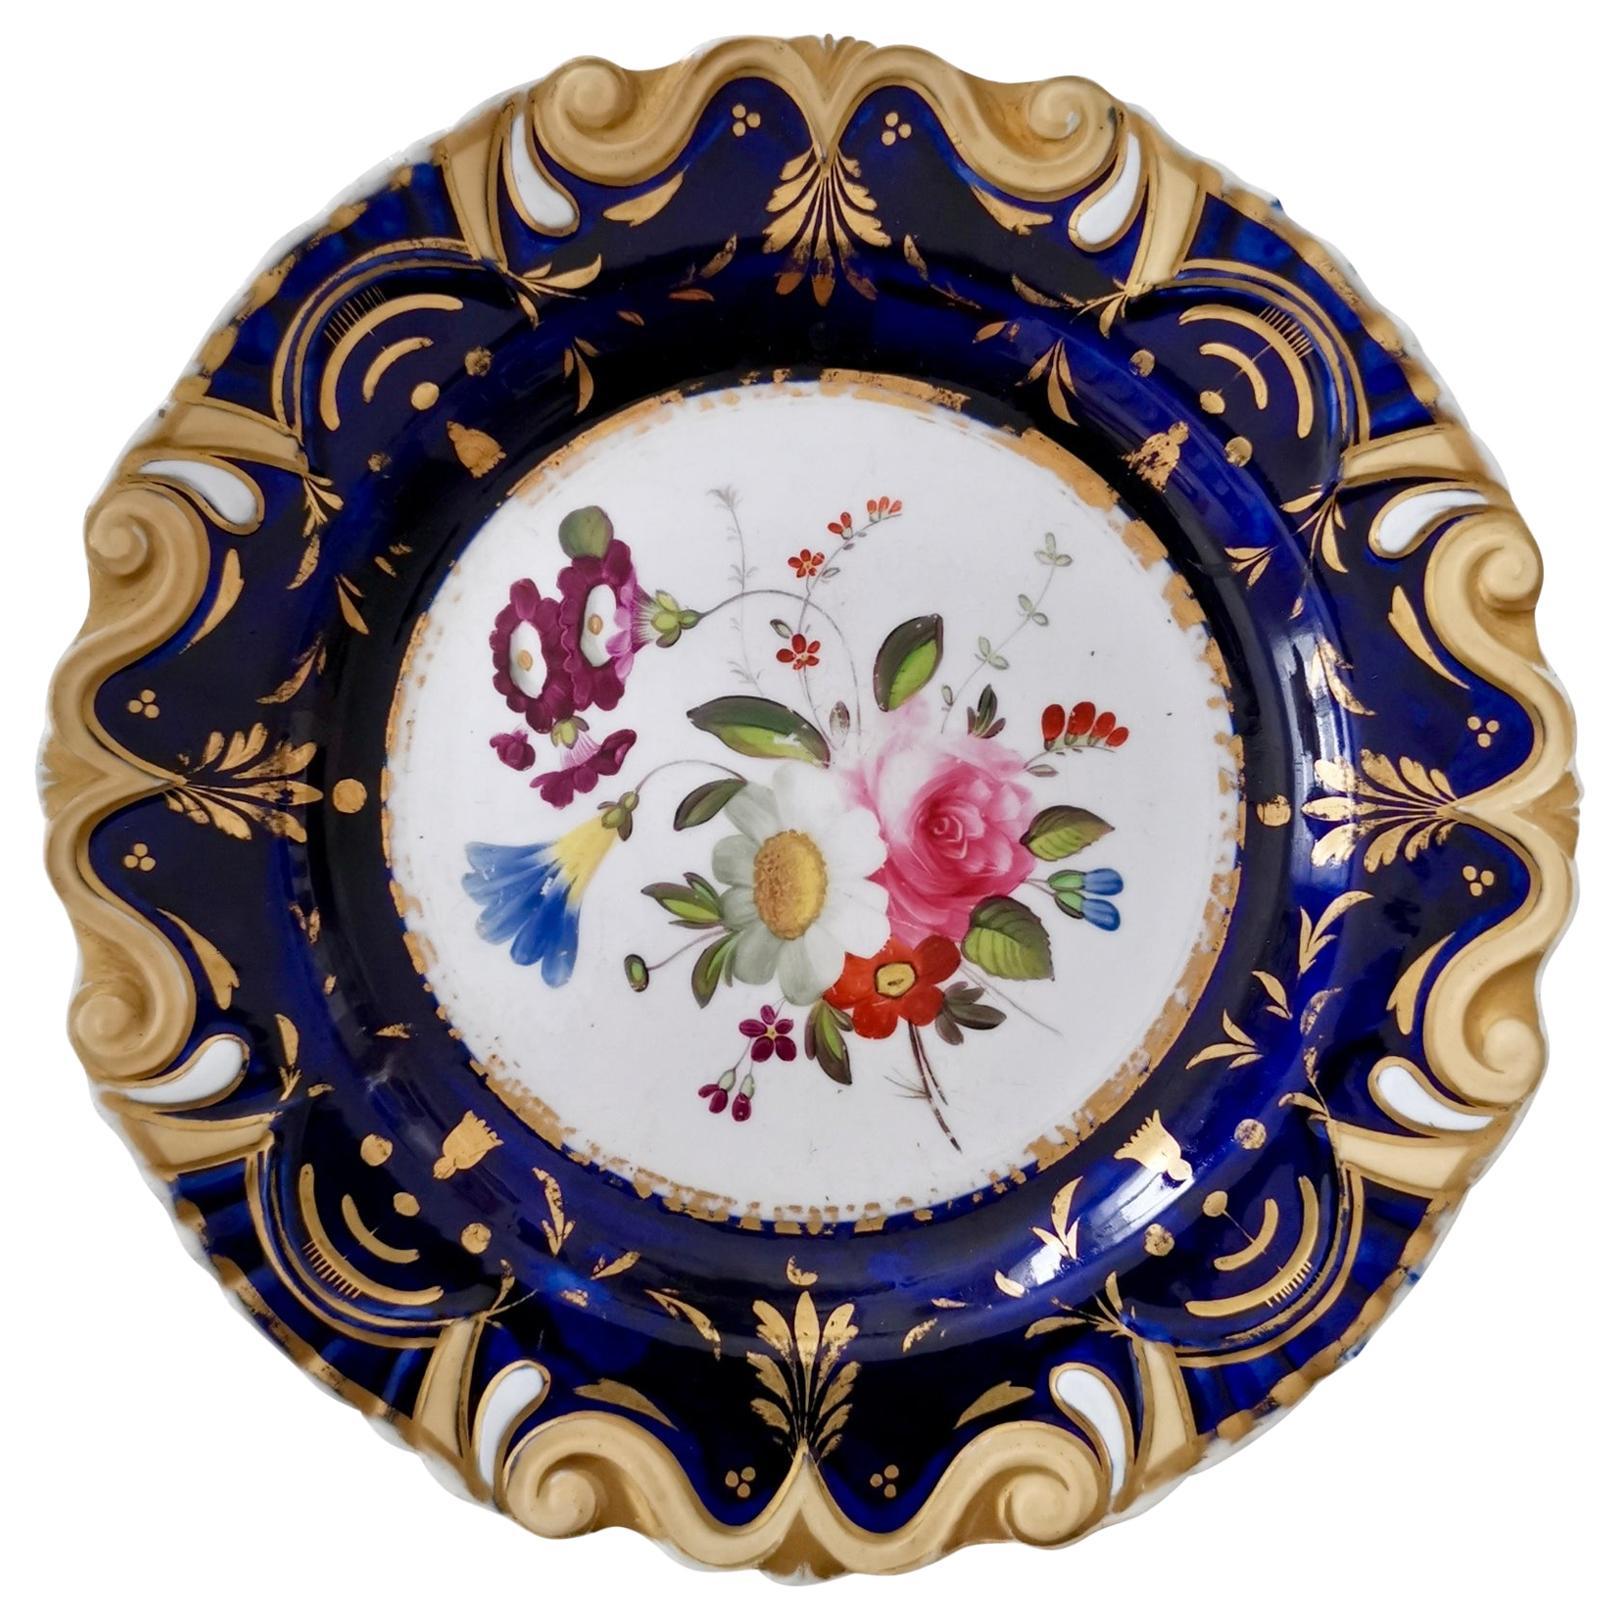 Machin Moustache Plate, Flowers on Cobalt Blue, Regency, circa 1825